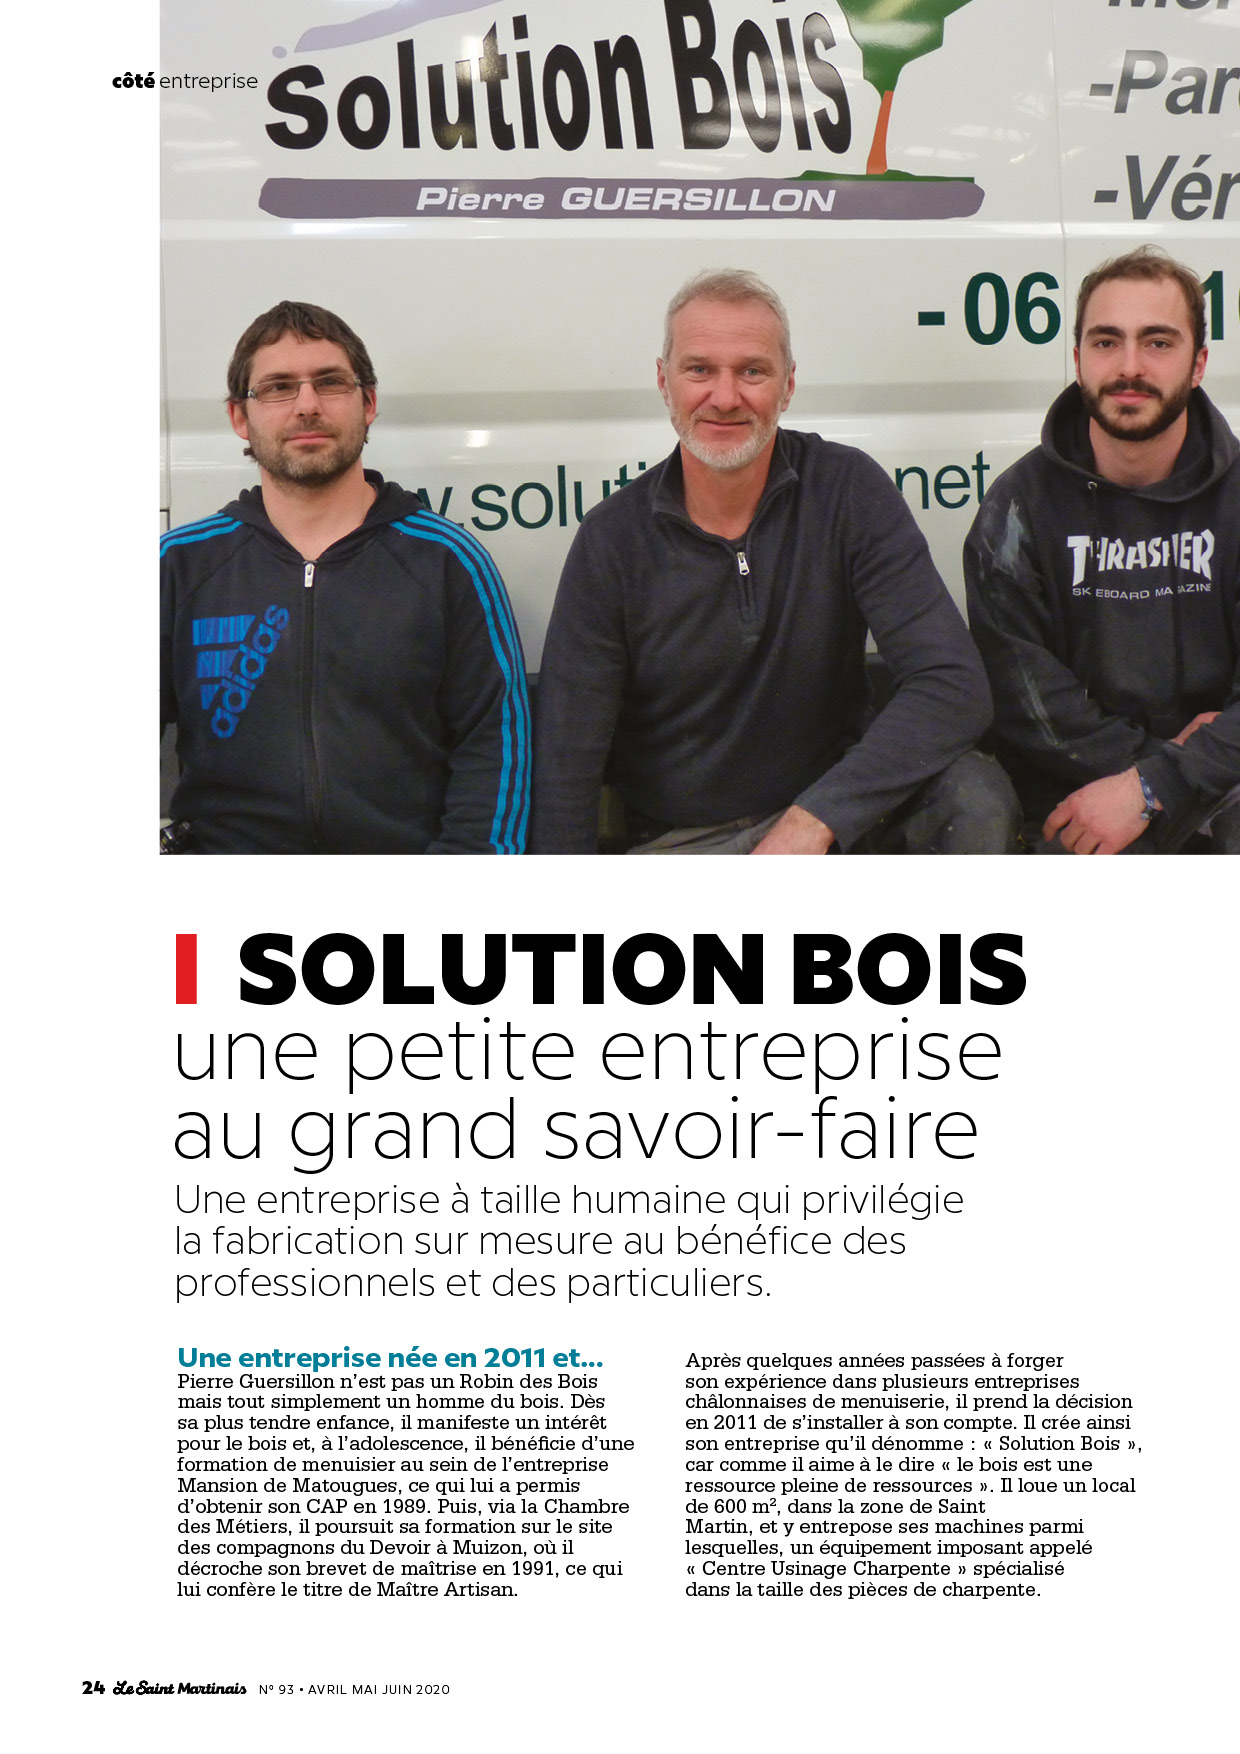 Solutions Bois